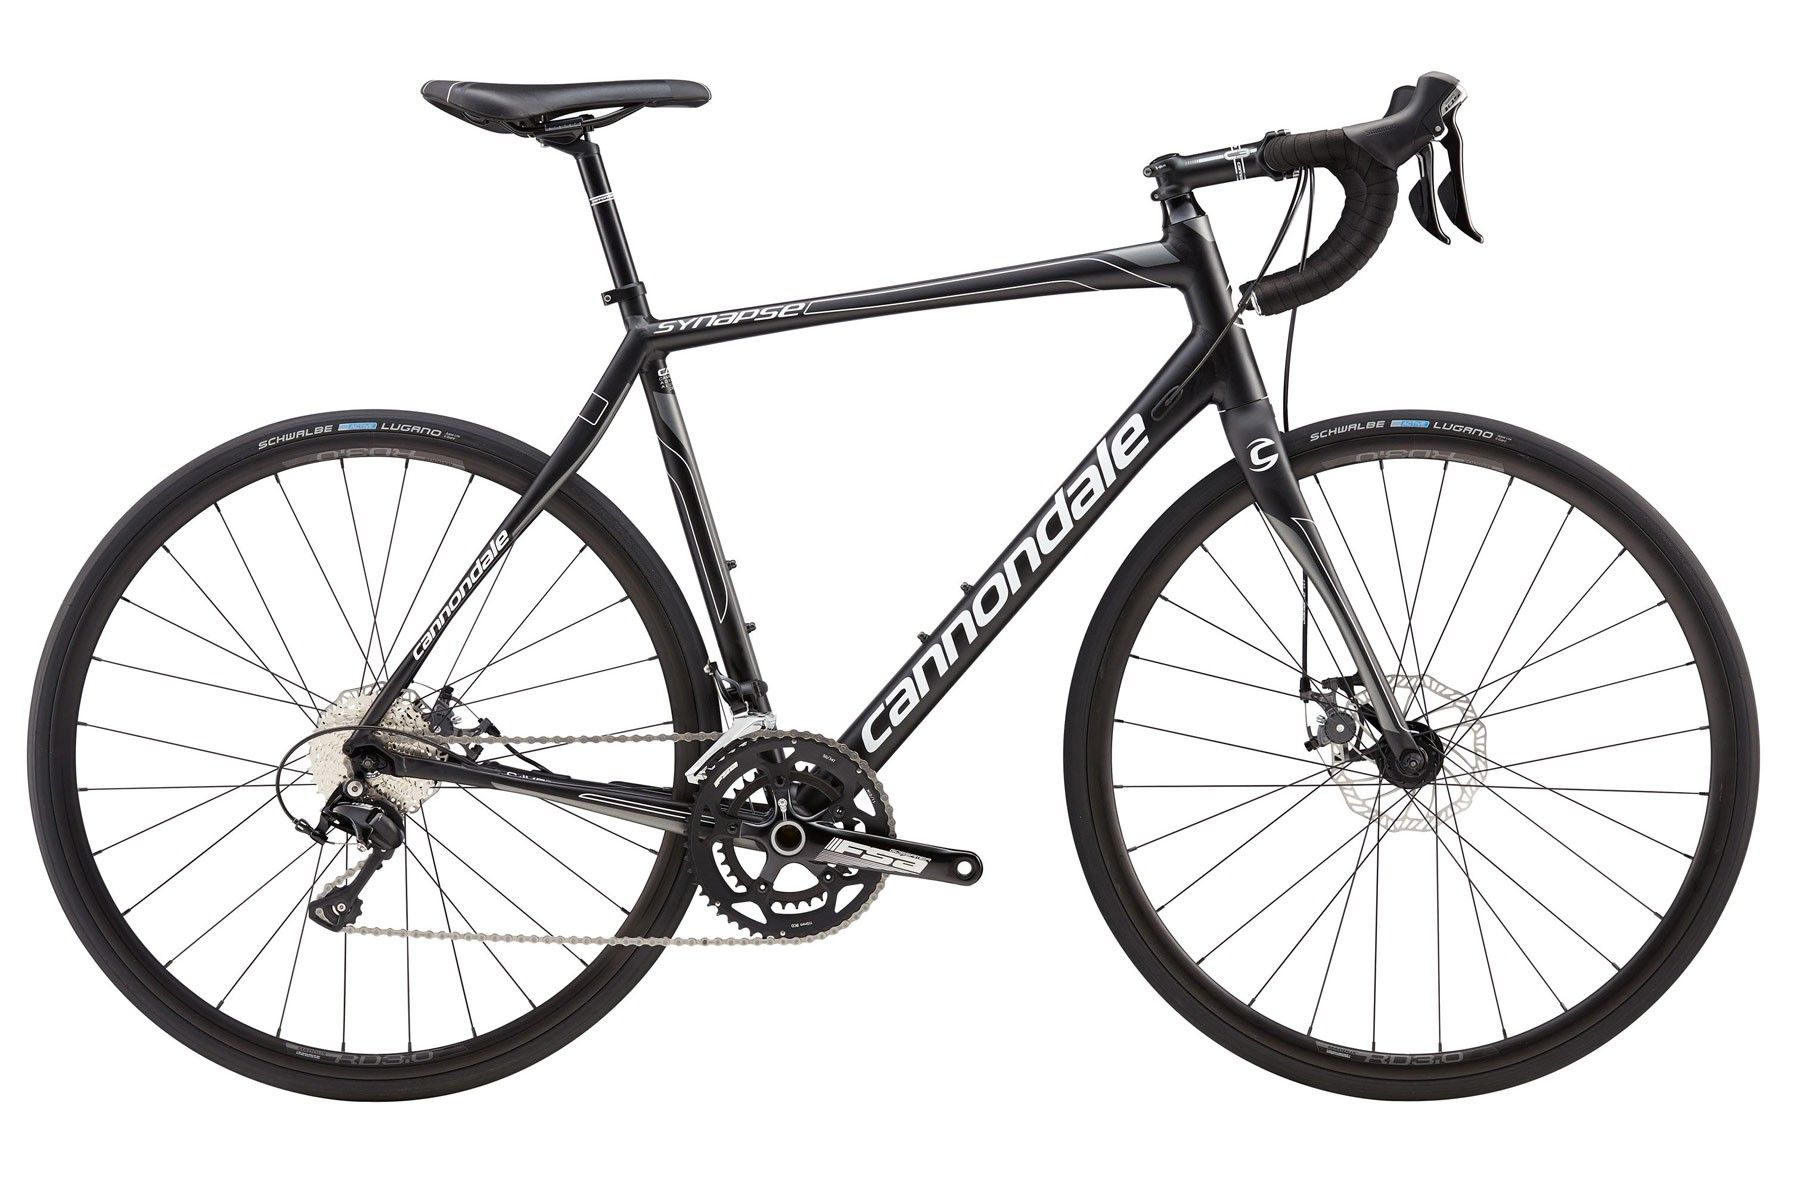 Synapse Disc 105 Synapse Endurance Road Road Bikes 2016 Cannondale Road Bikes Road Bike